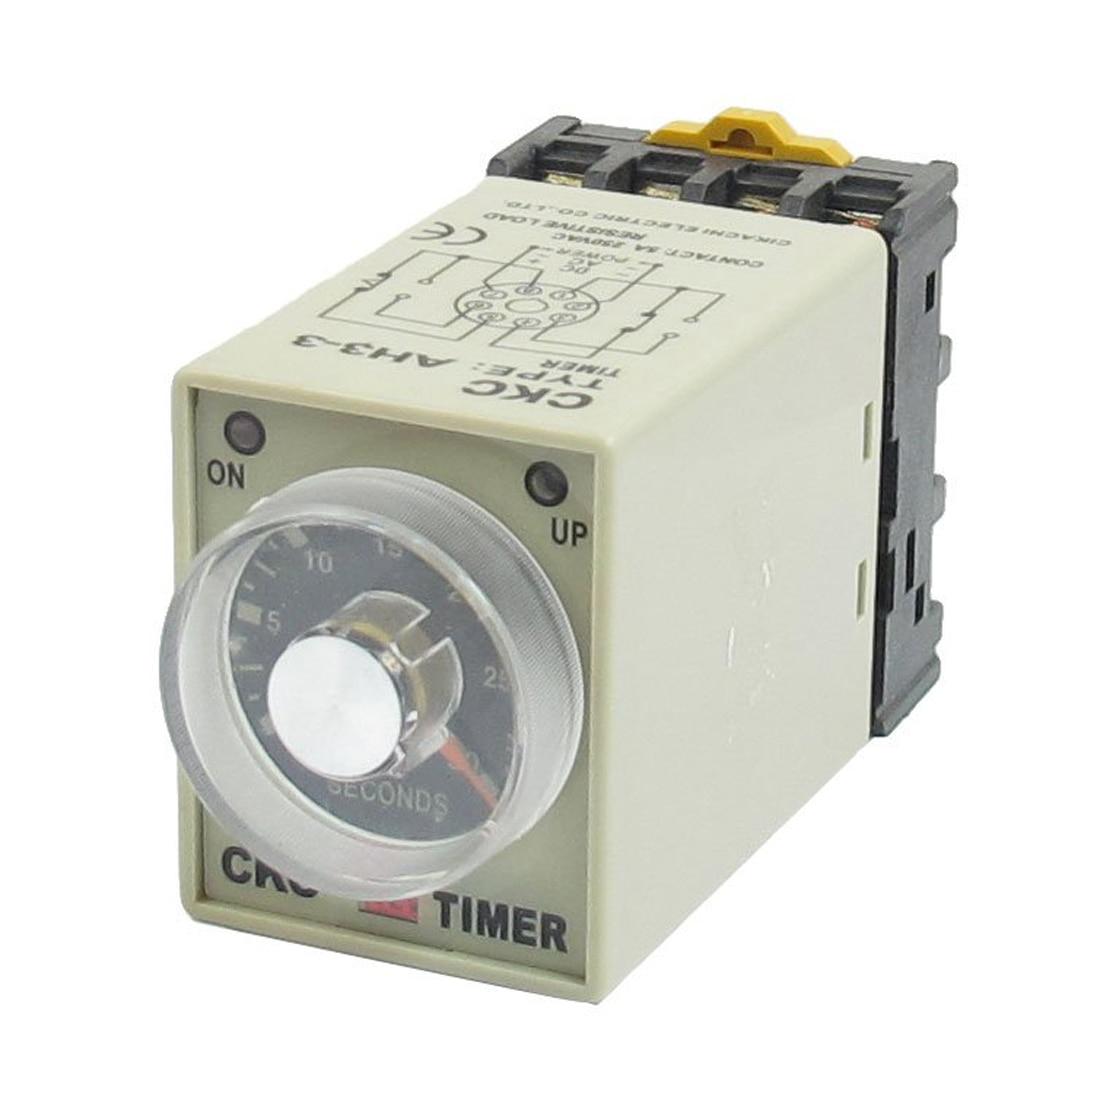 DHDL-DC 12V 0-30 Seconds 30s Electric Delay Timer Timing Relay DPDT 8P w Base knob control dc24v dc12v ac110v ac220v 8p dpdt 5s seconds timer time delay relay w socket h3y 2